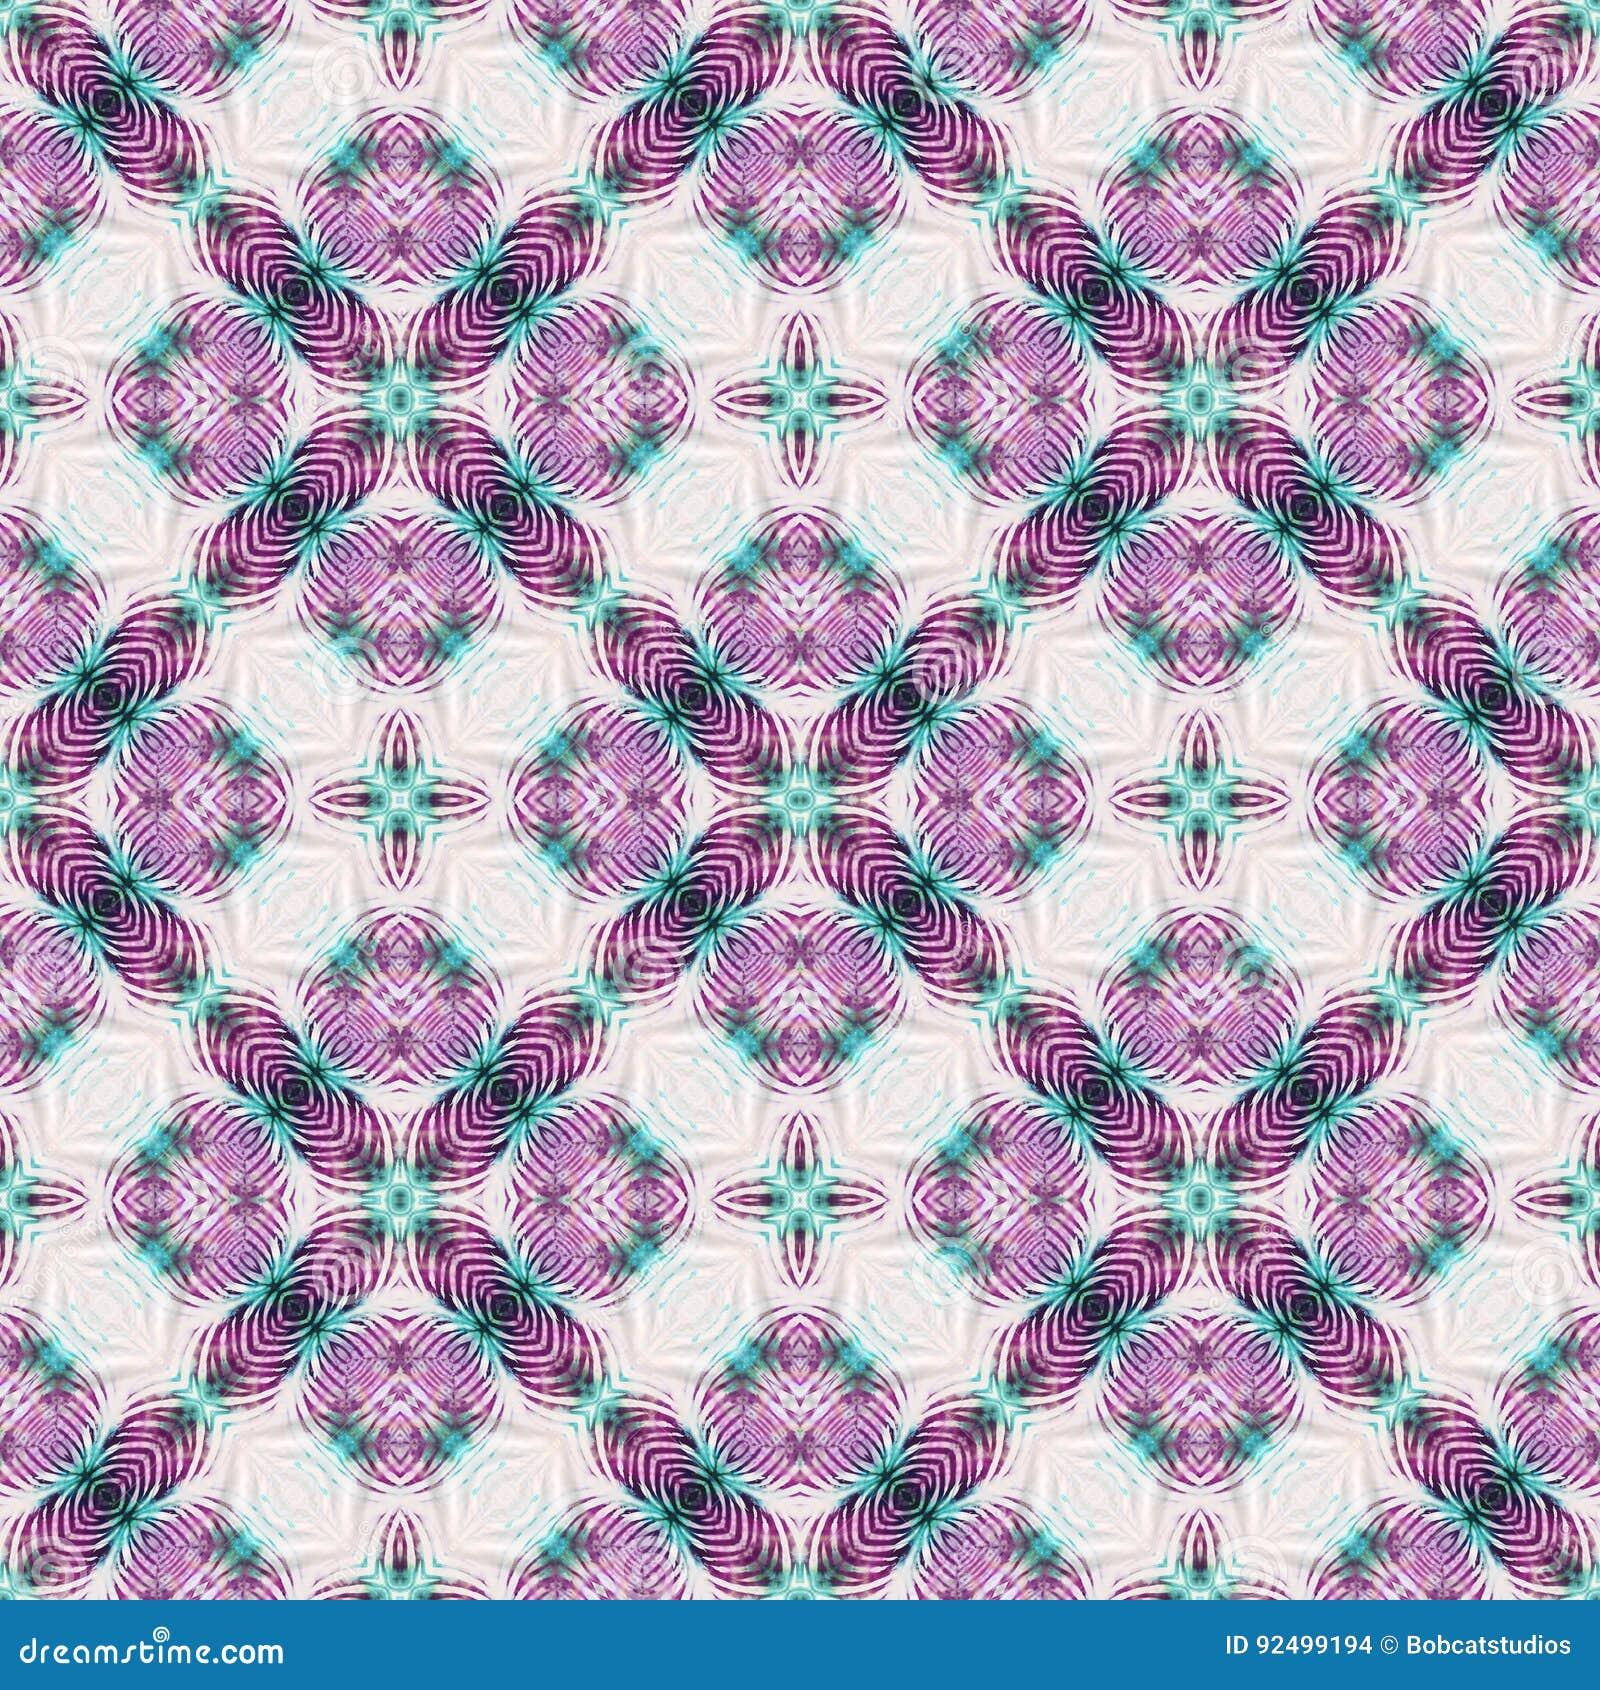 seamless repeating tie dye - photo #5